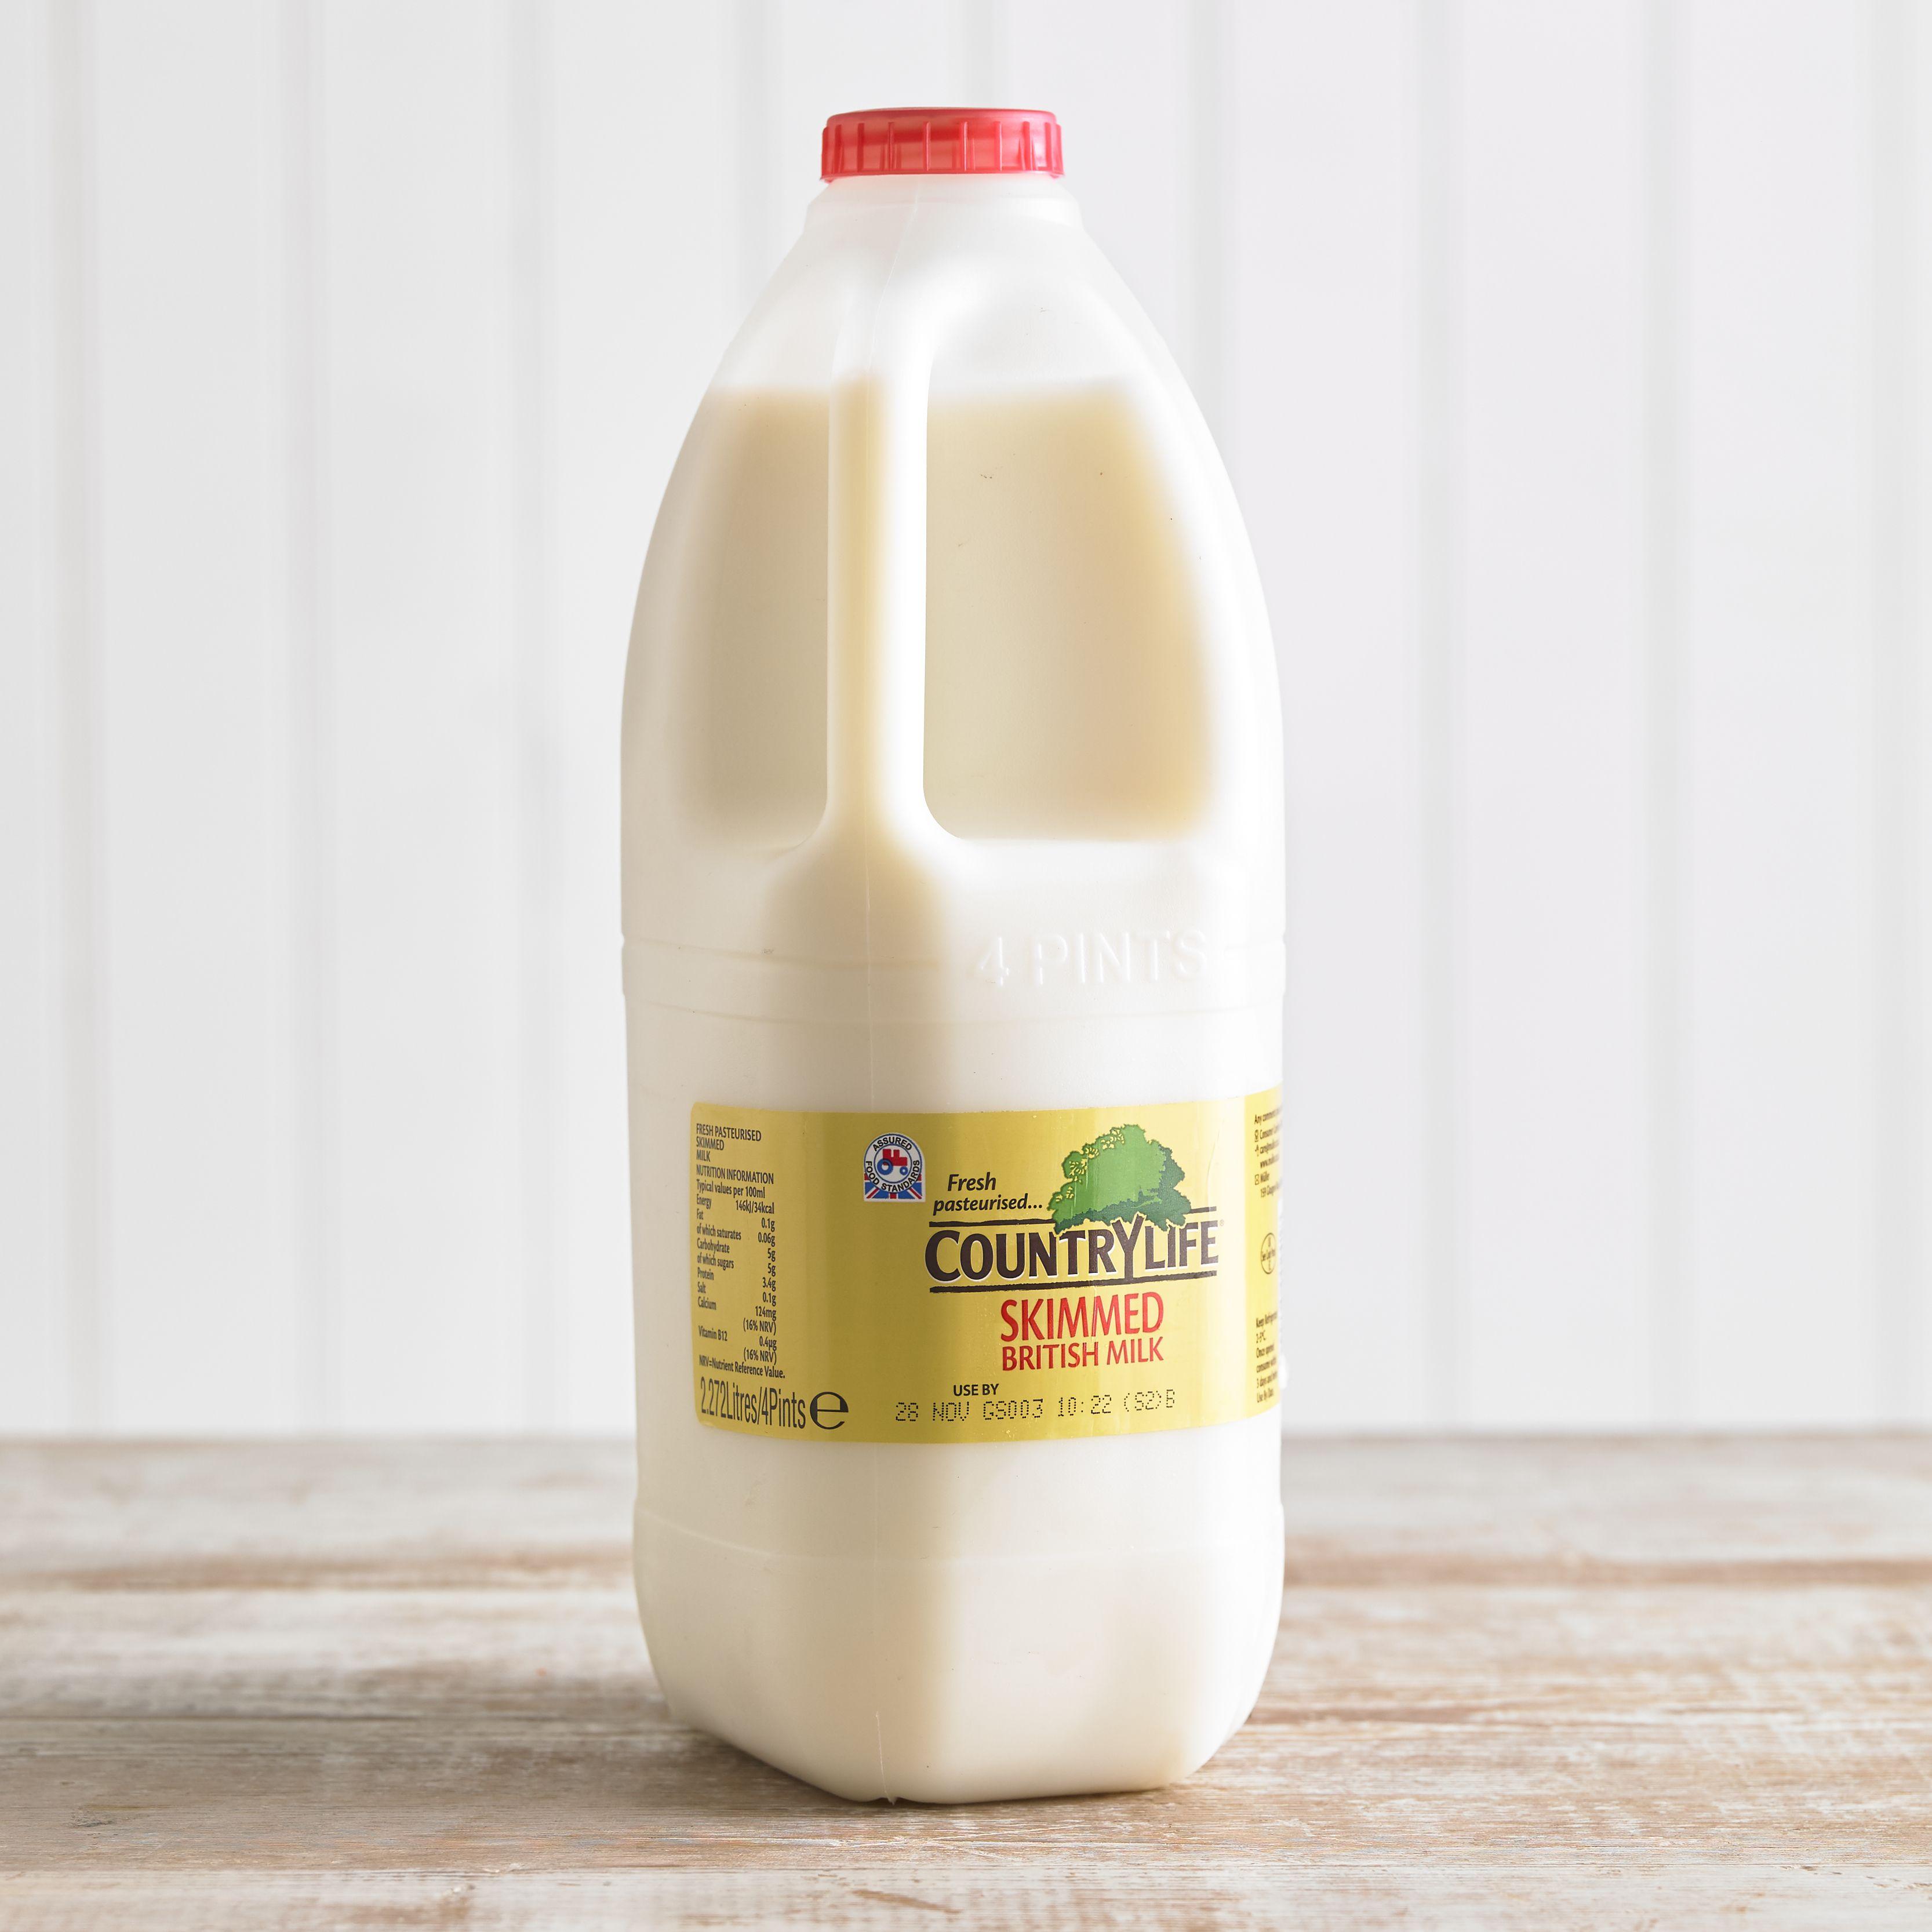 Country Life Skimmed Milk, 2.27L, 4pt